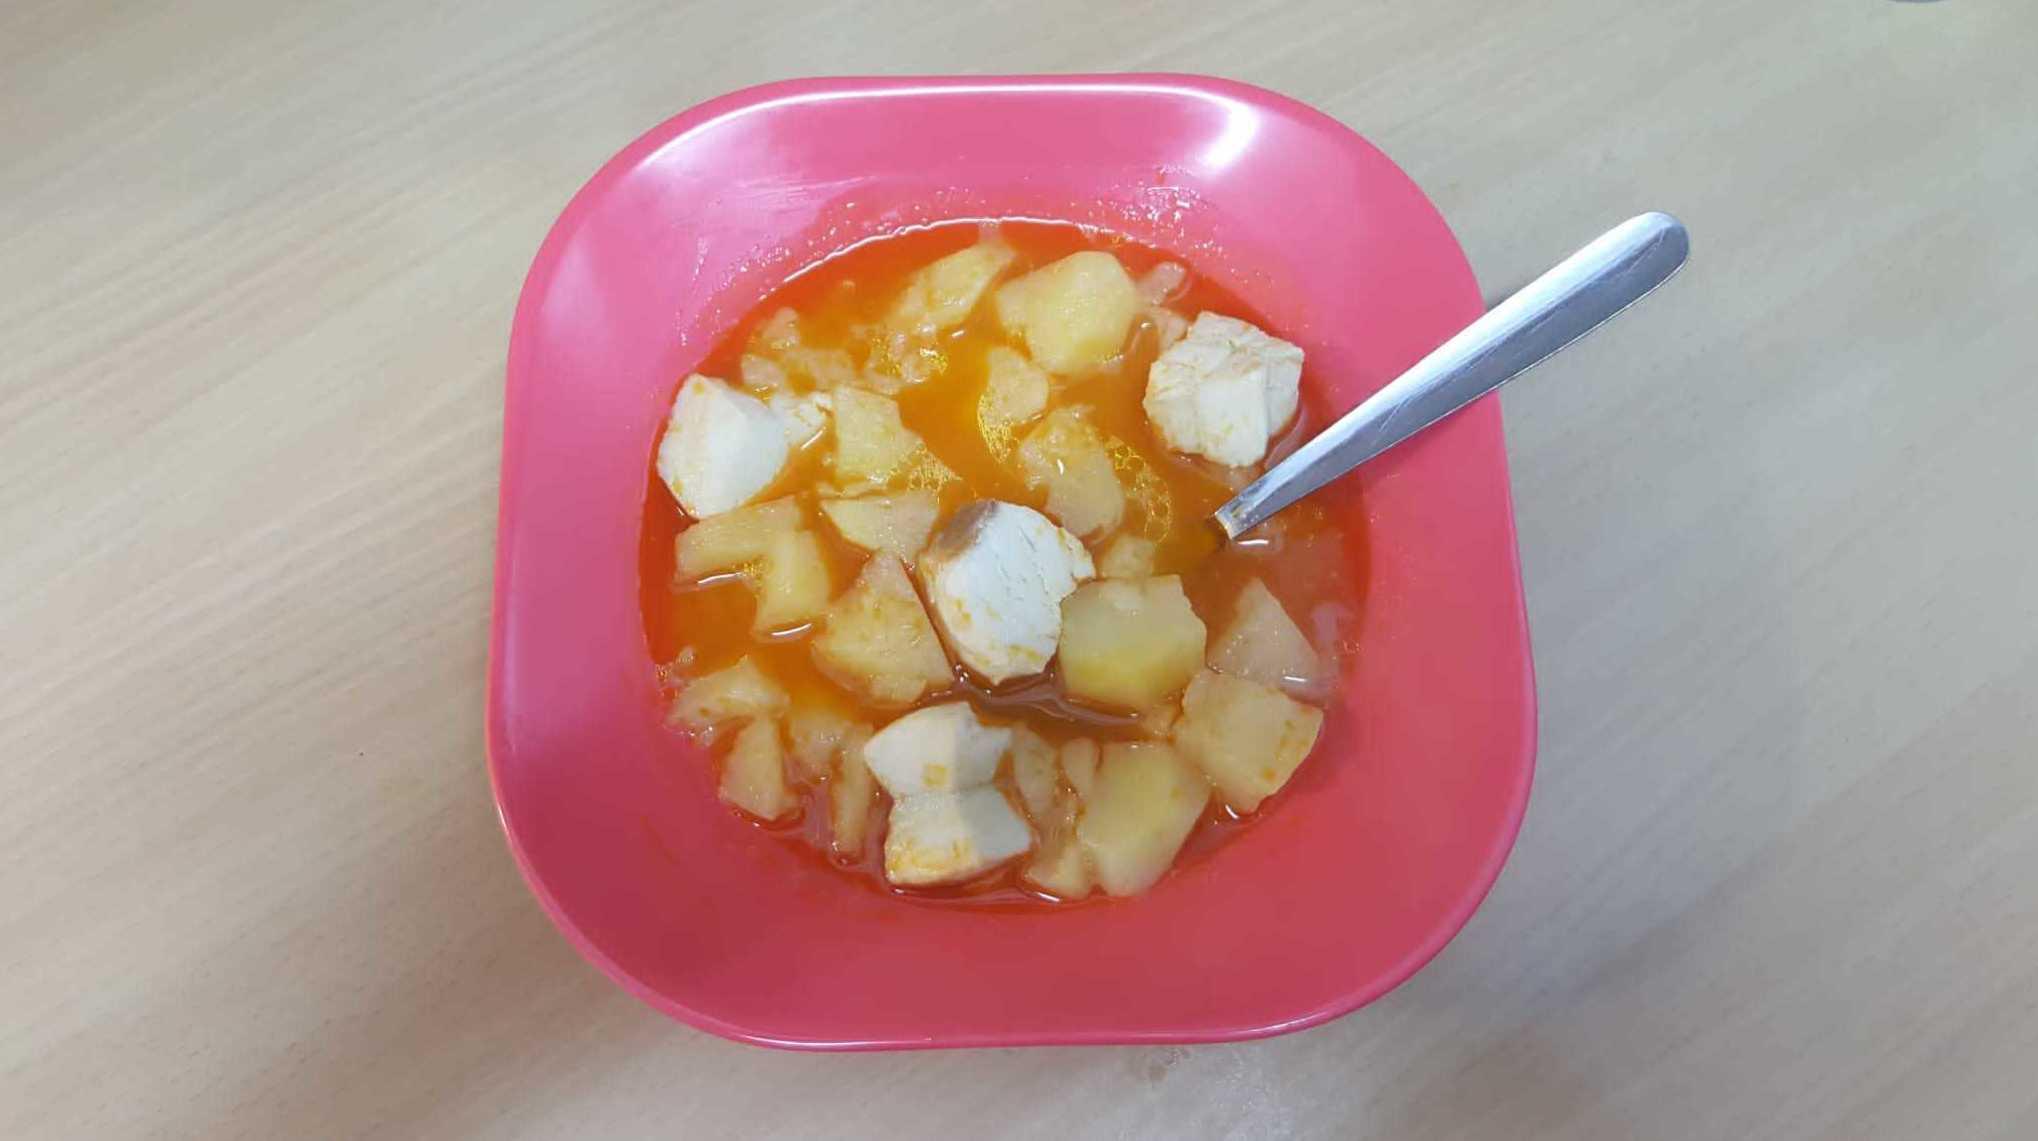 escuela infantil comida casera